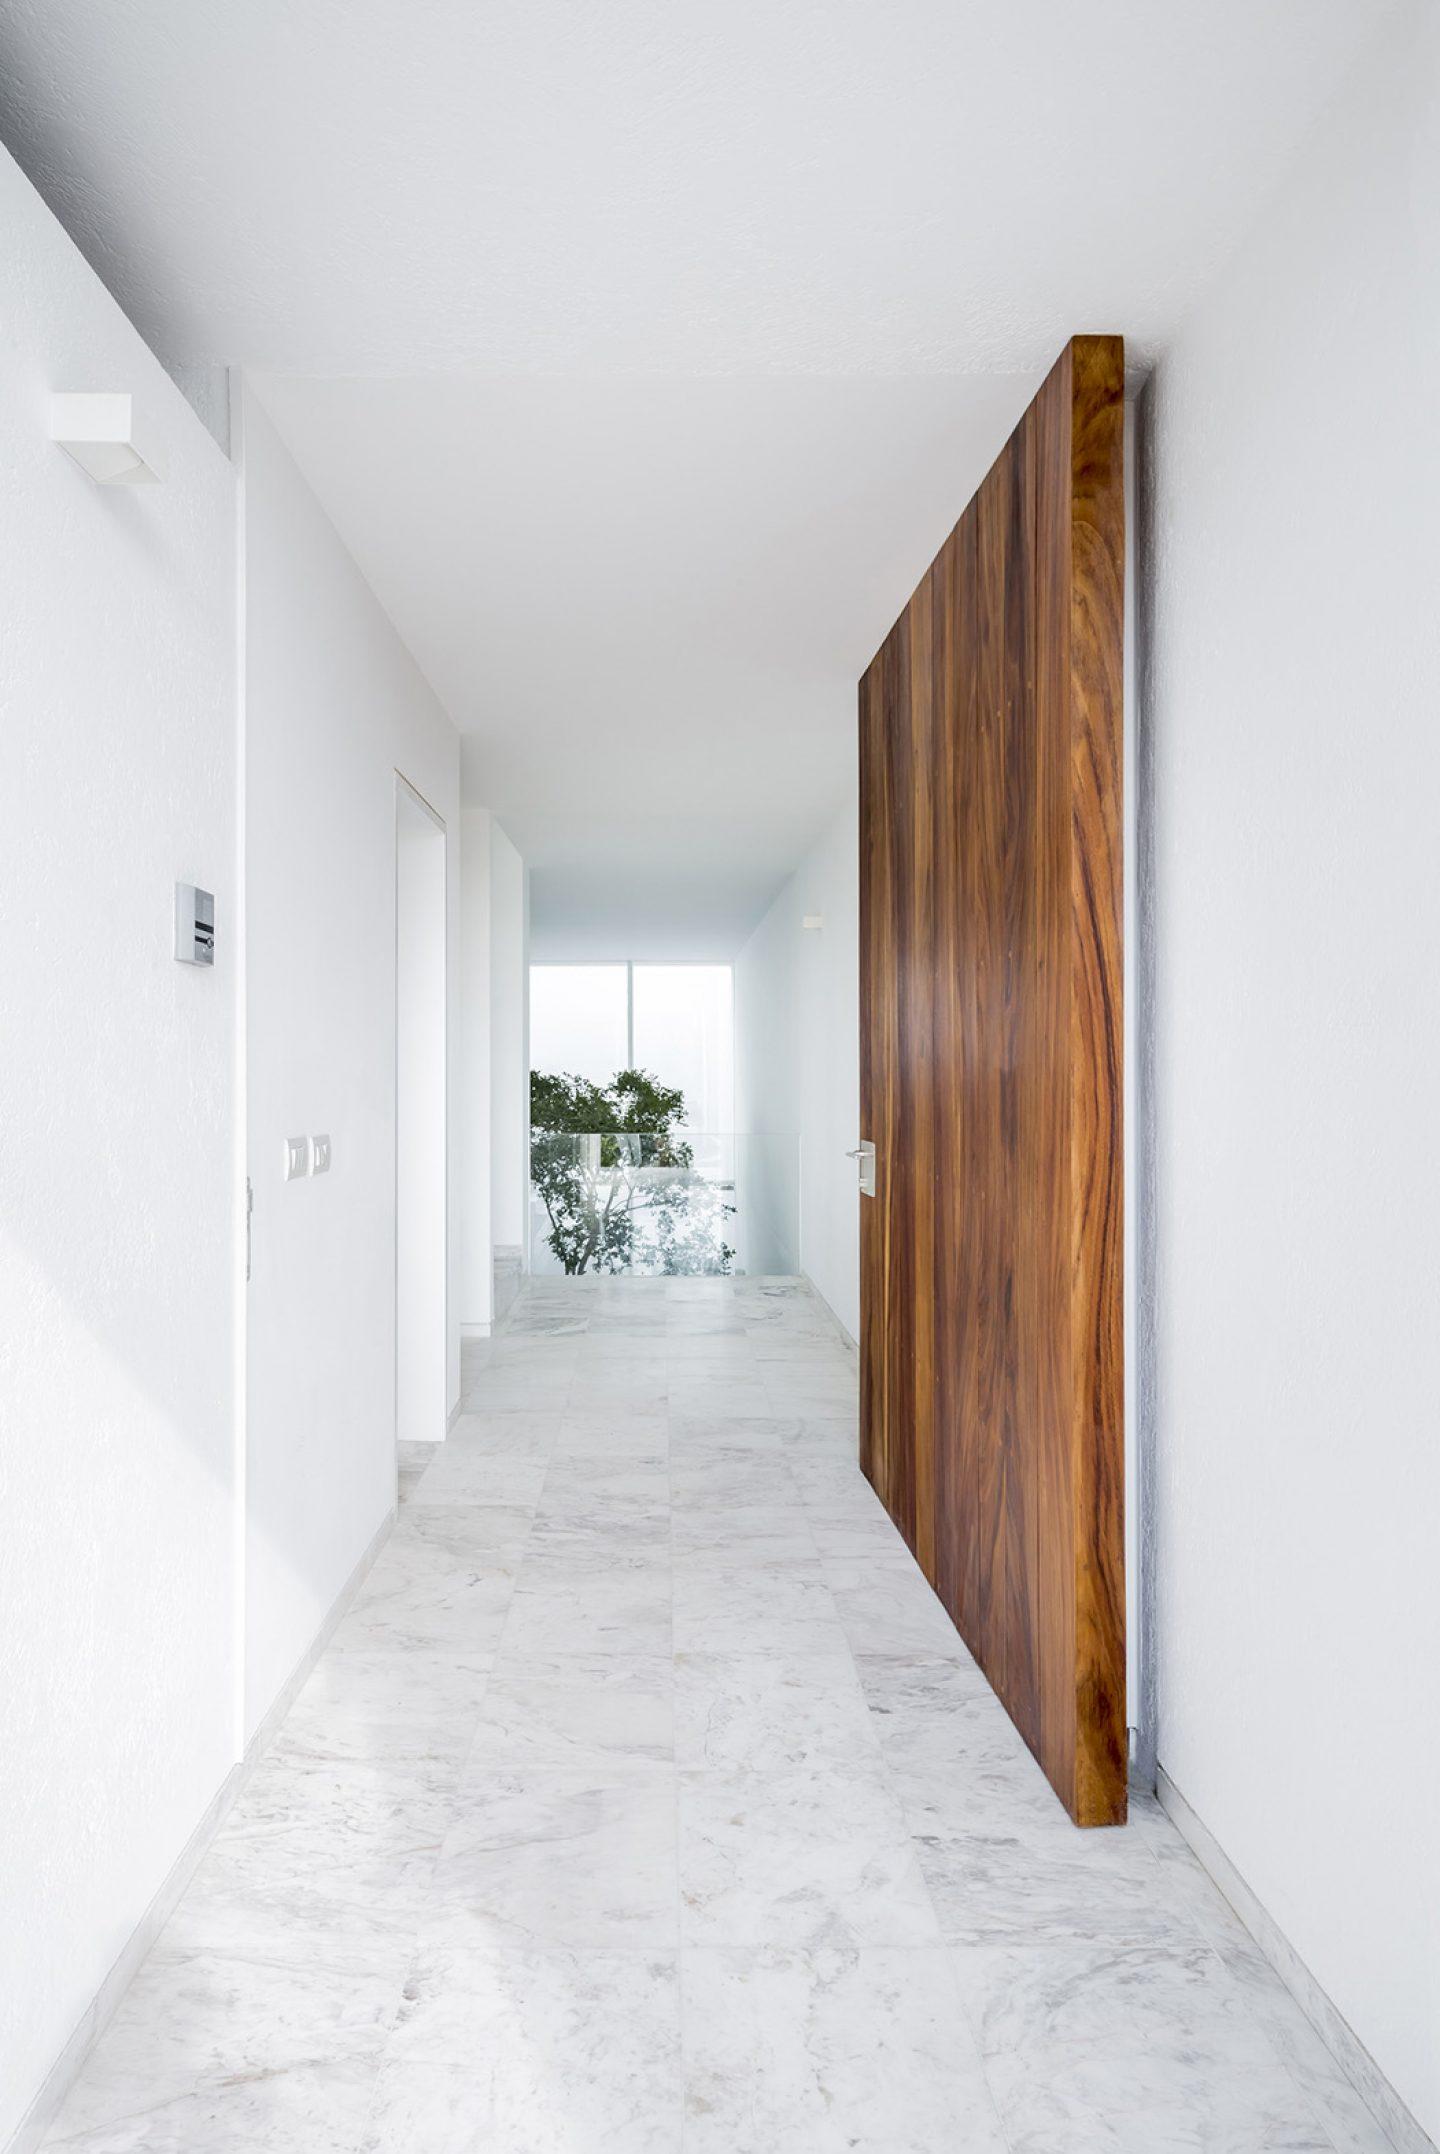 iGNANT_Architecture_Cave_House_Abraham_Cota_Paredes26